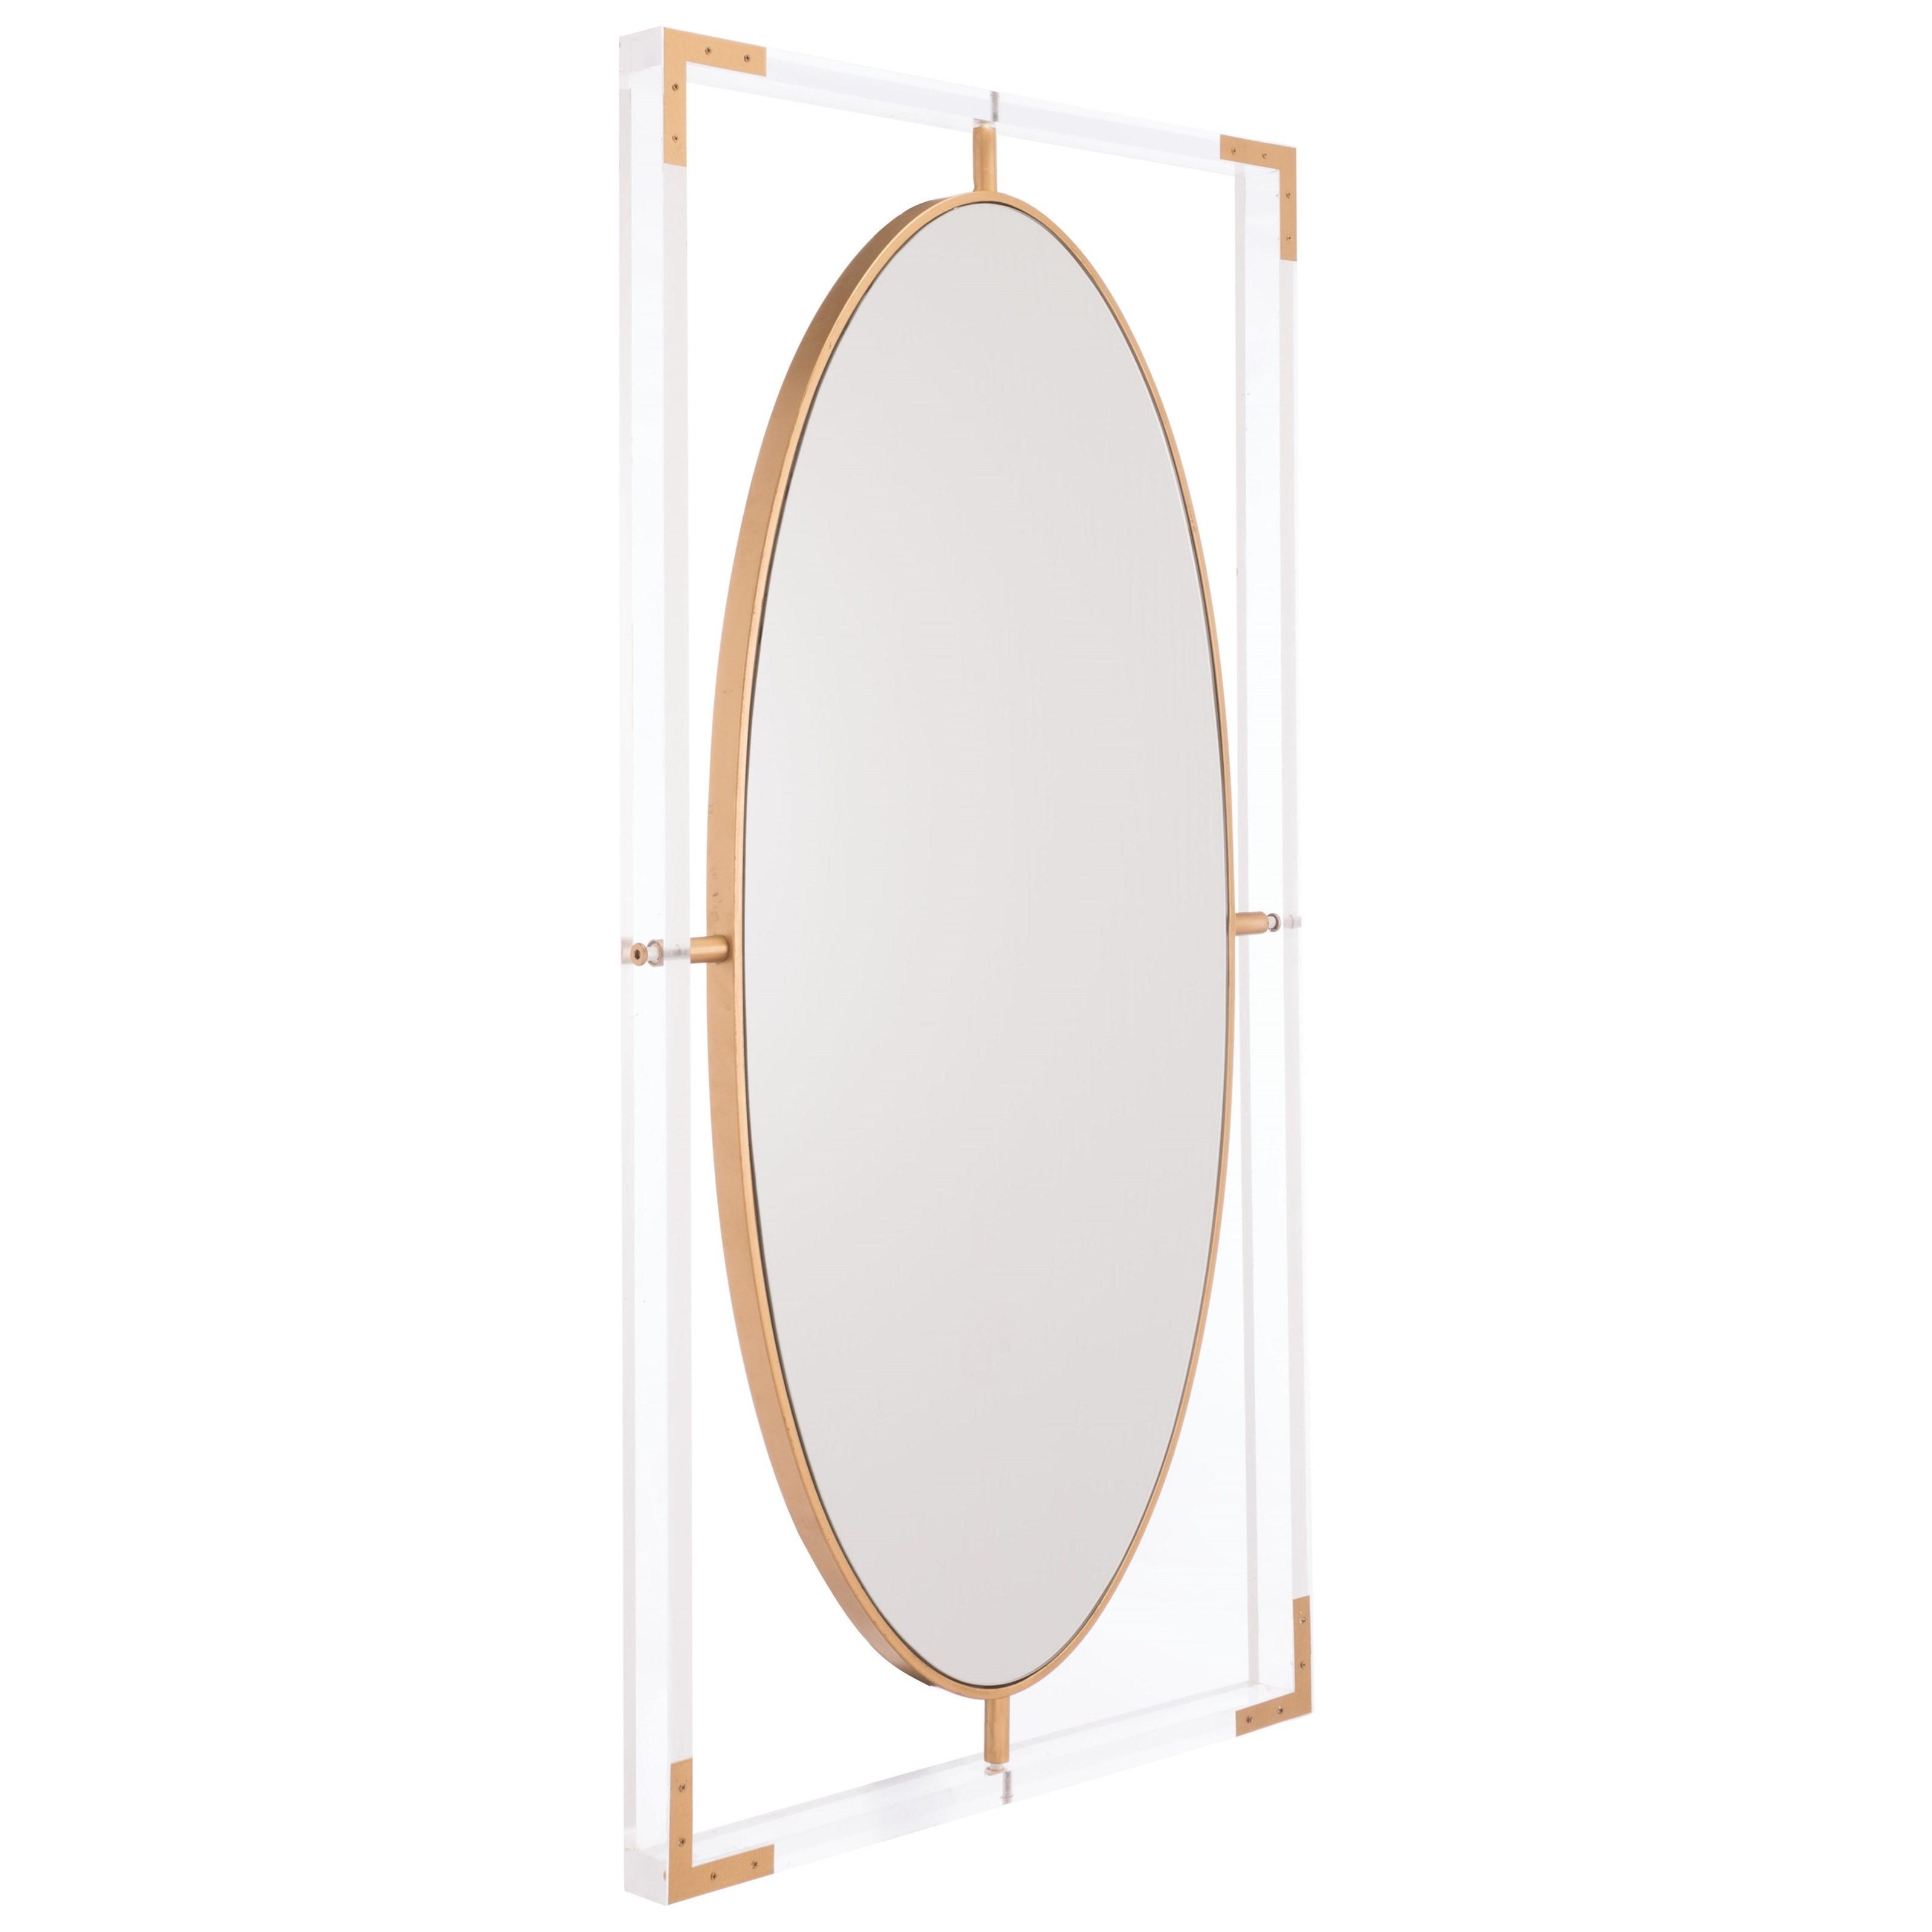 Zuo Mirrors Lucite Rectangular Mirror - Item Number: A11055